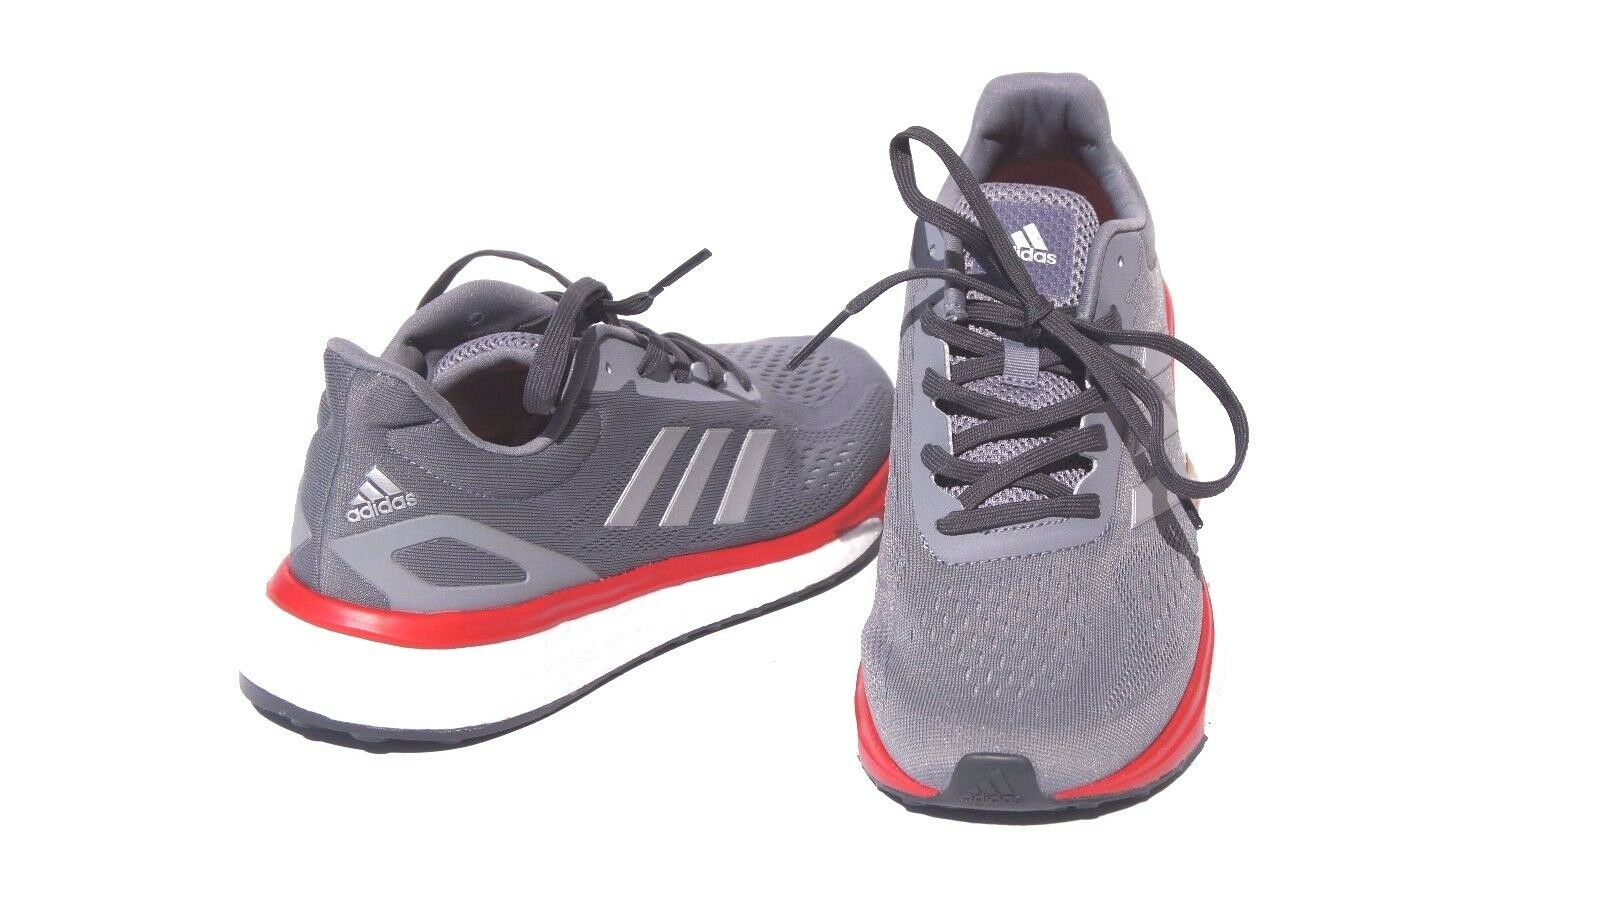 Adidas adidas fahren - schuhe fördern männer fahren adidas gray nib bequem e069c6